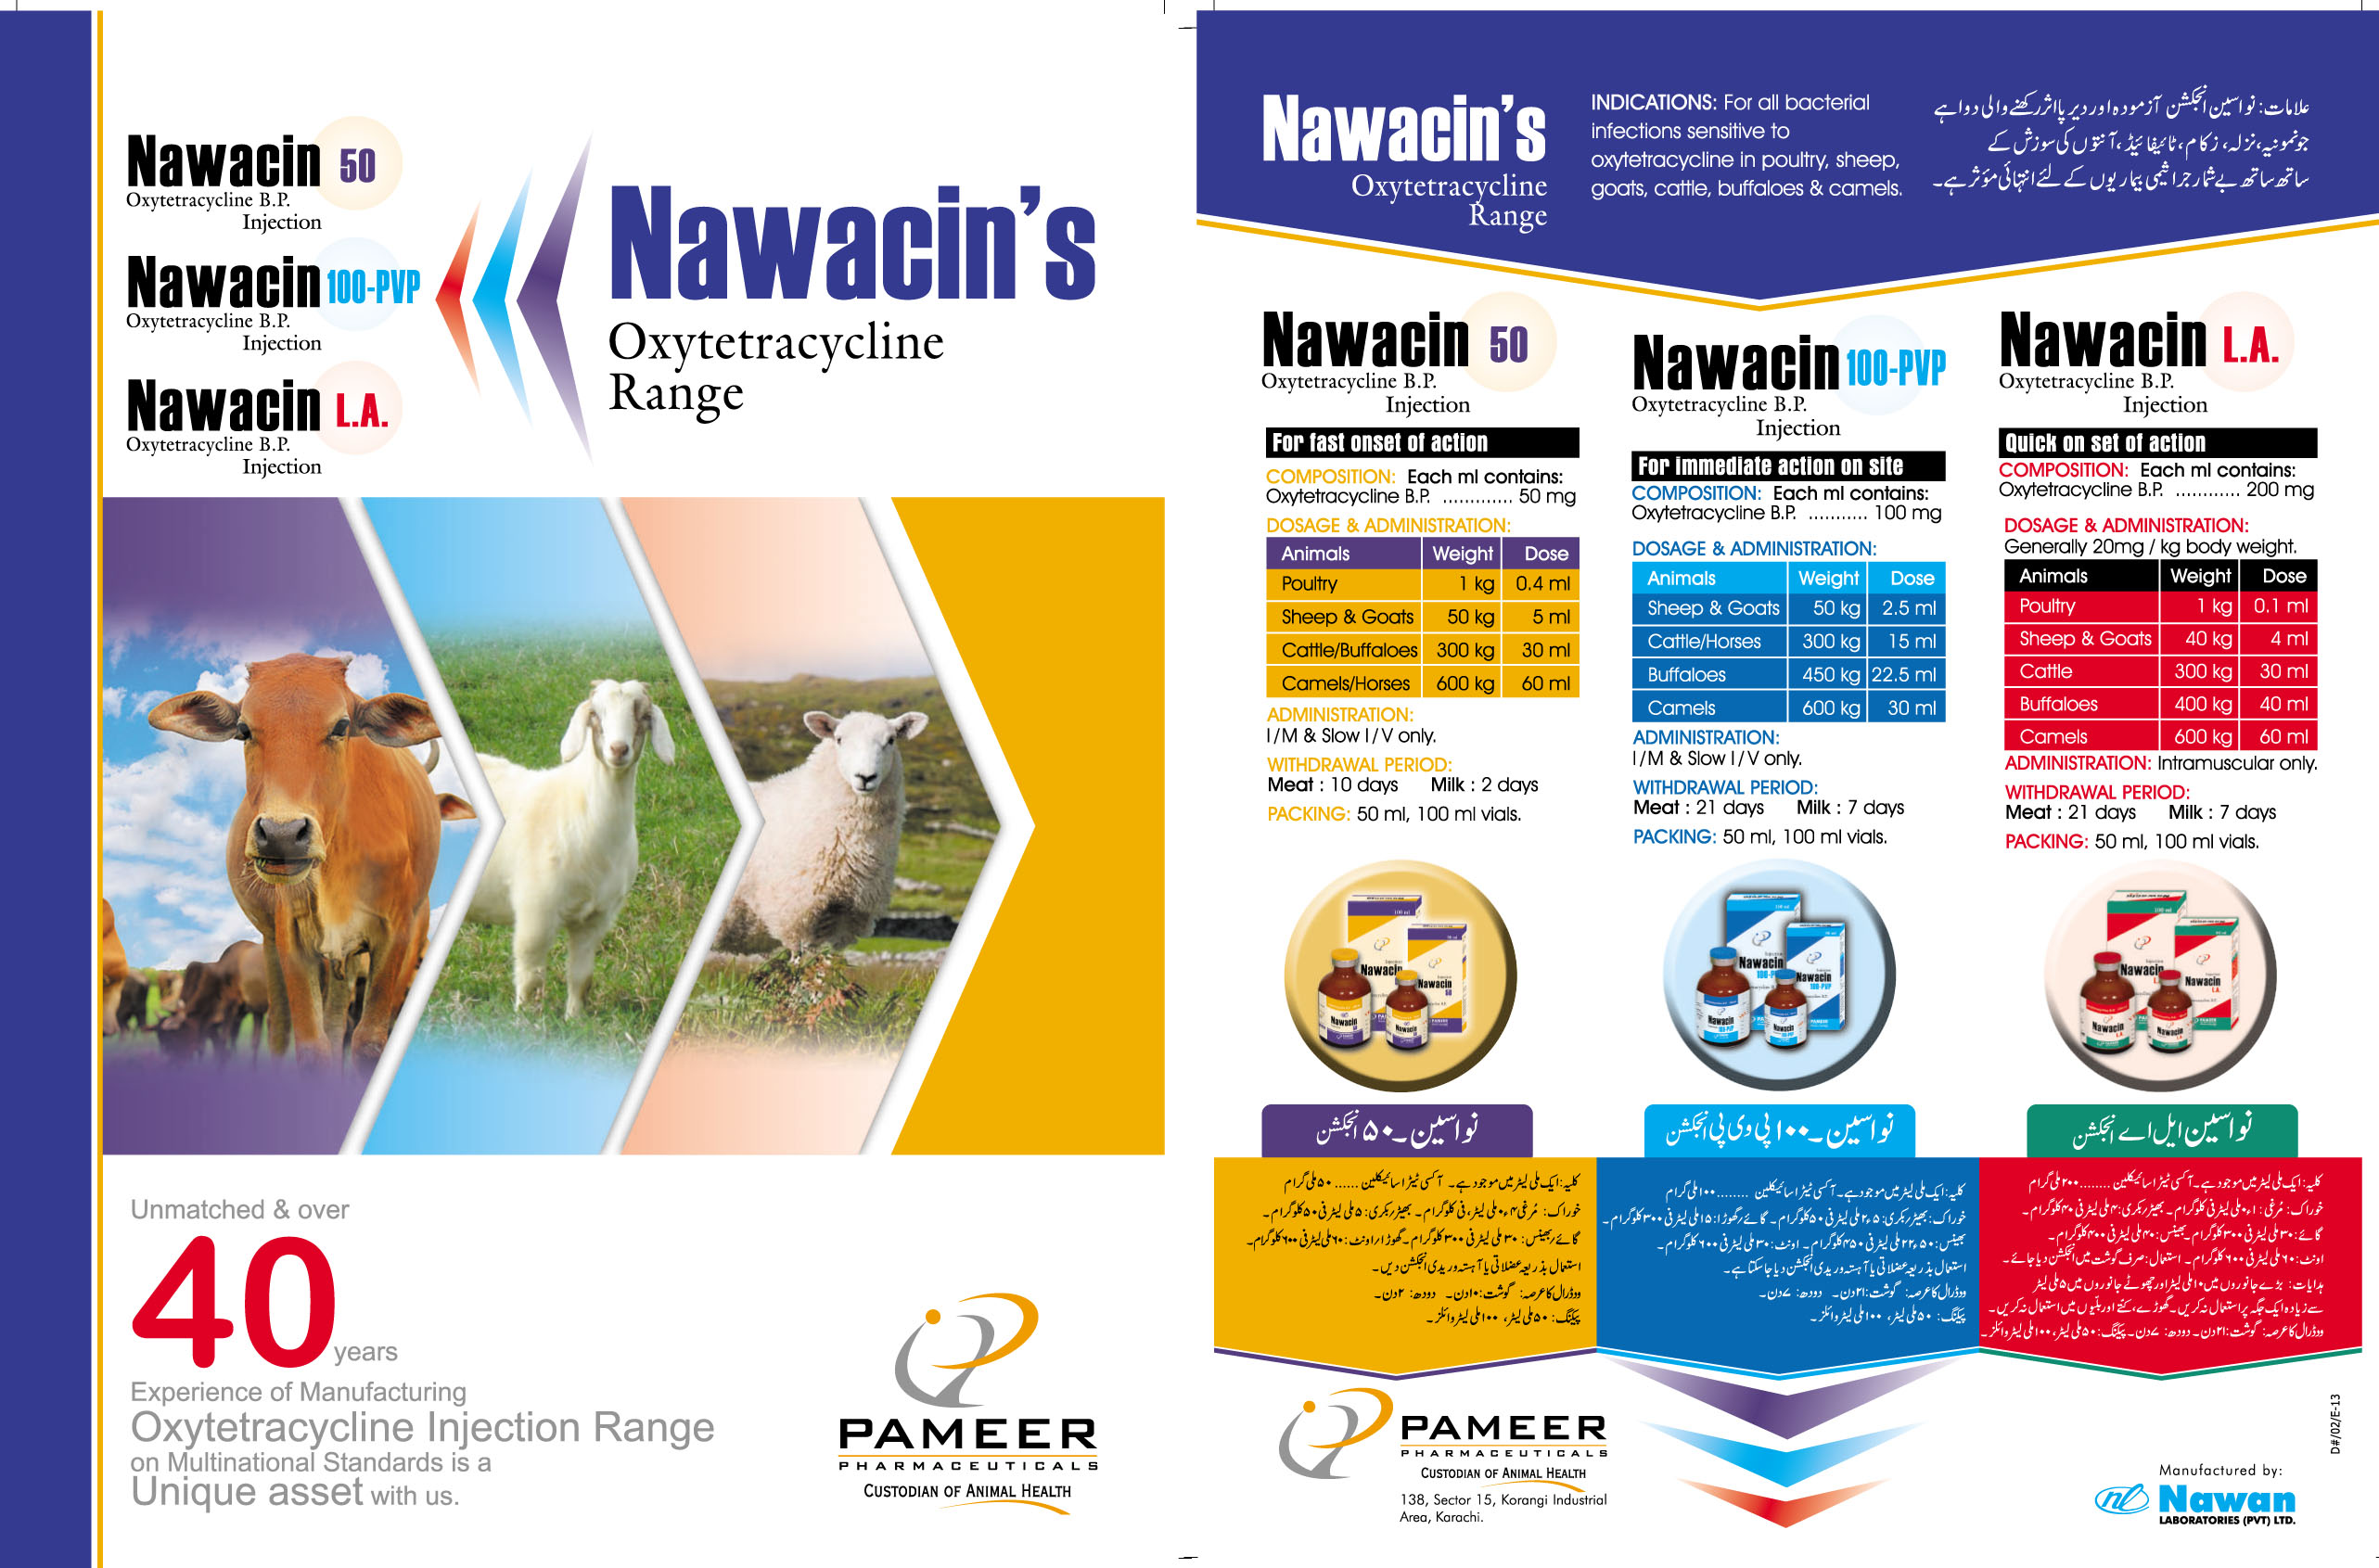 Nawacin 50 injection!